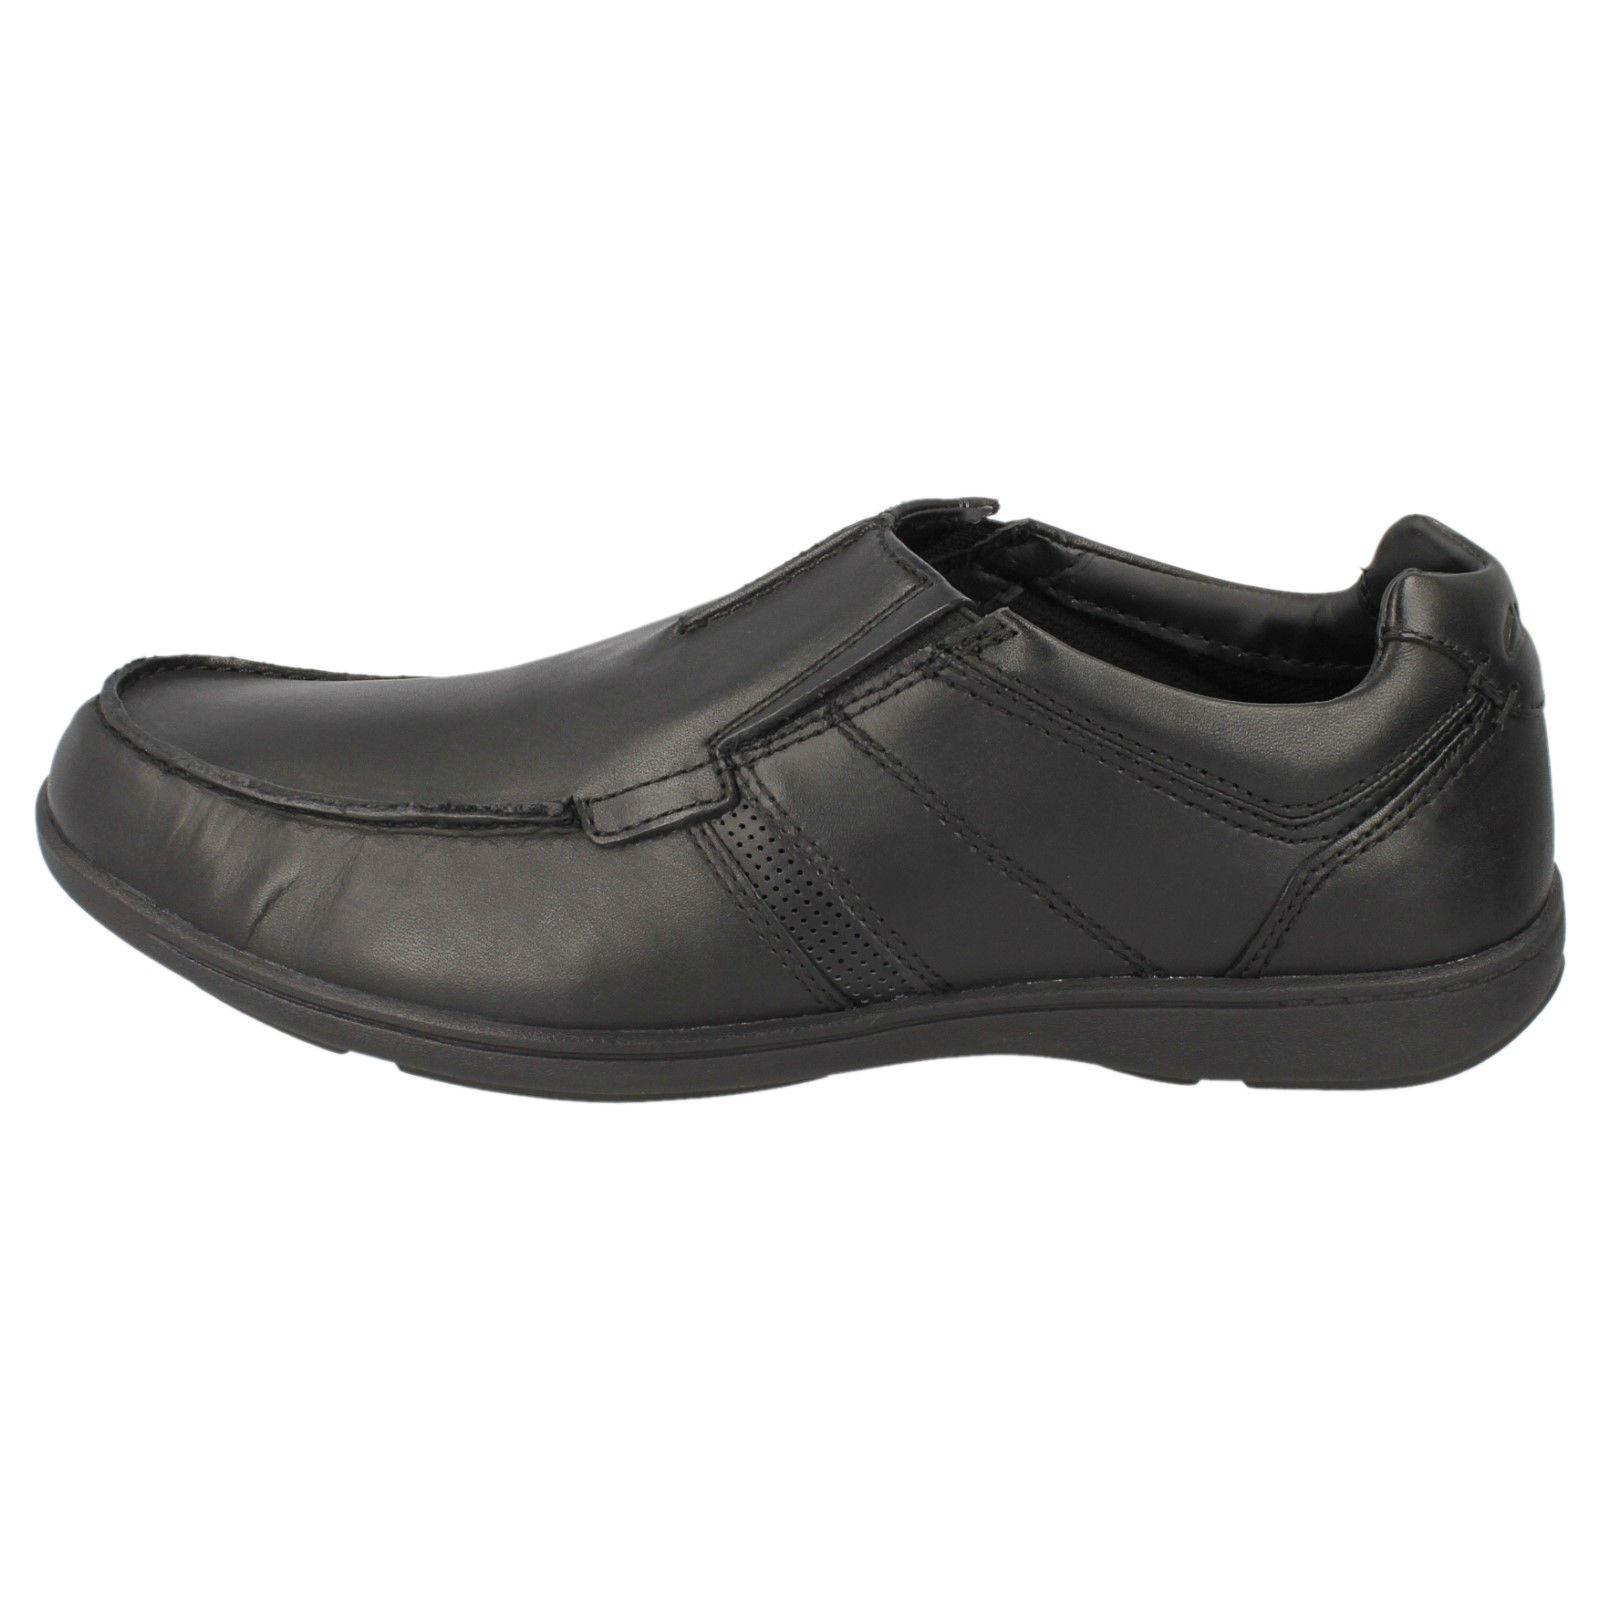 Clarks Shoes Mens Formal